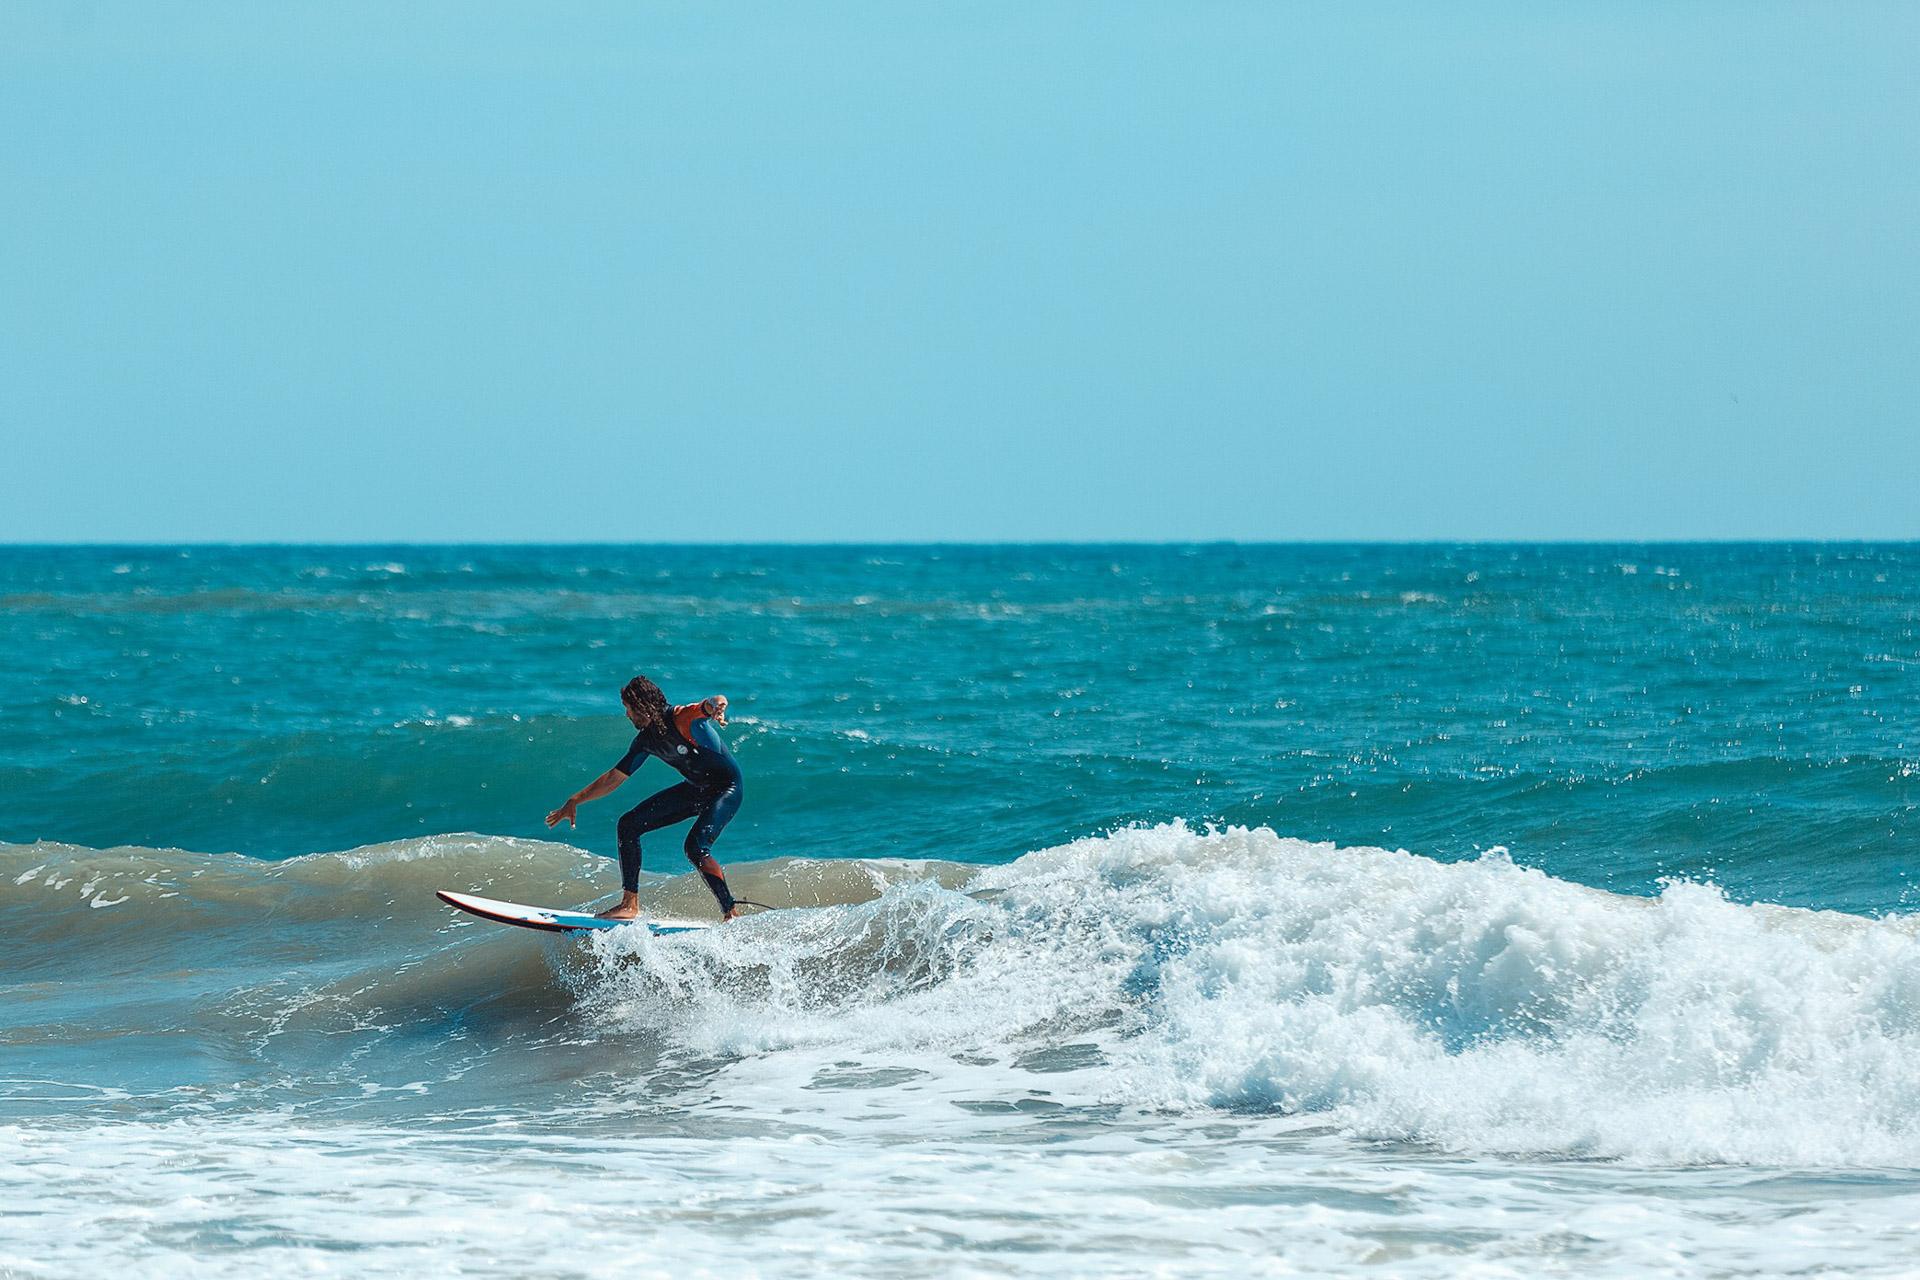 Surfs it like its hot